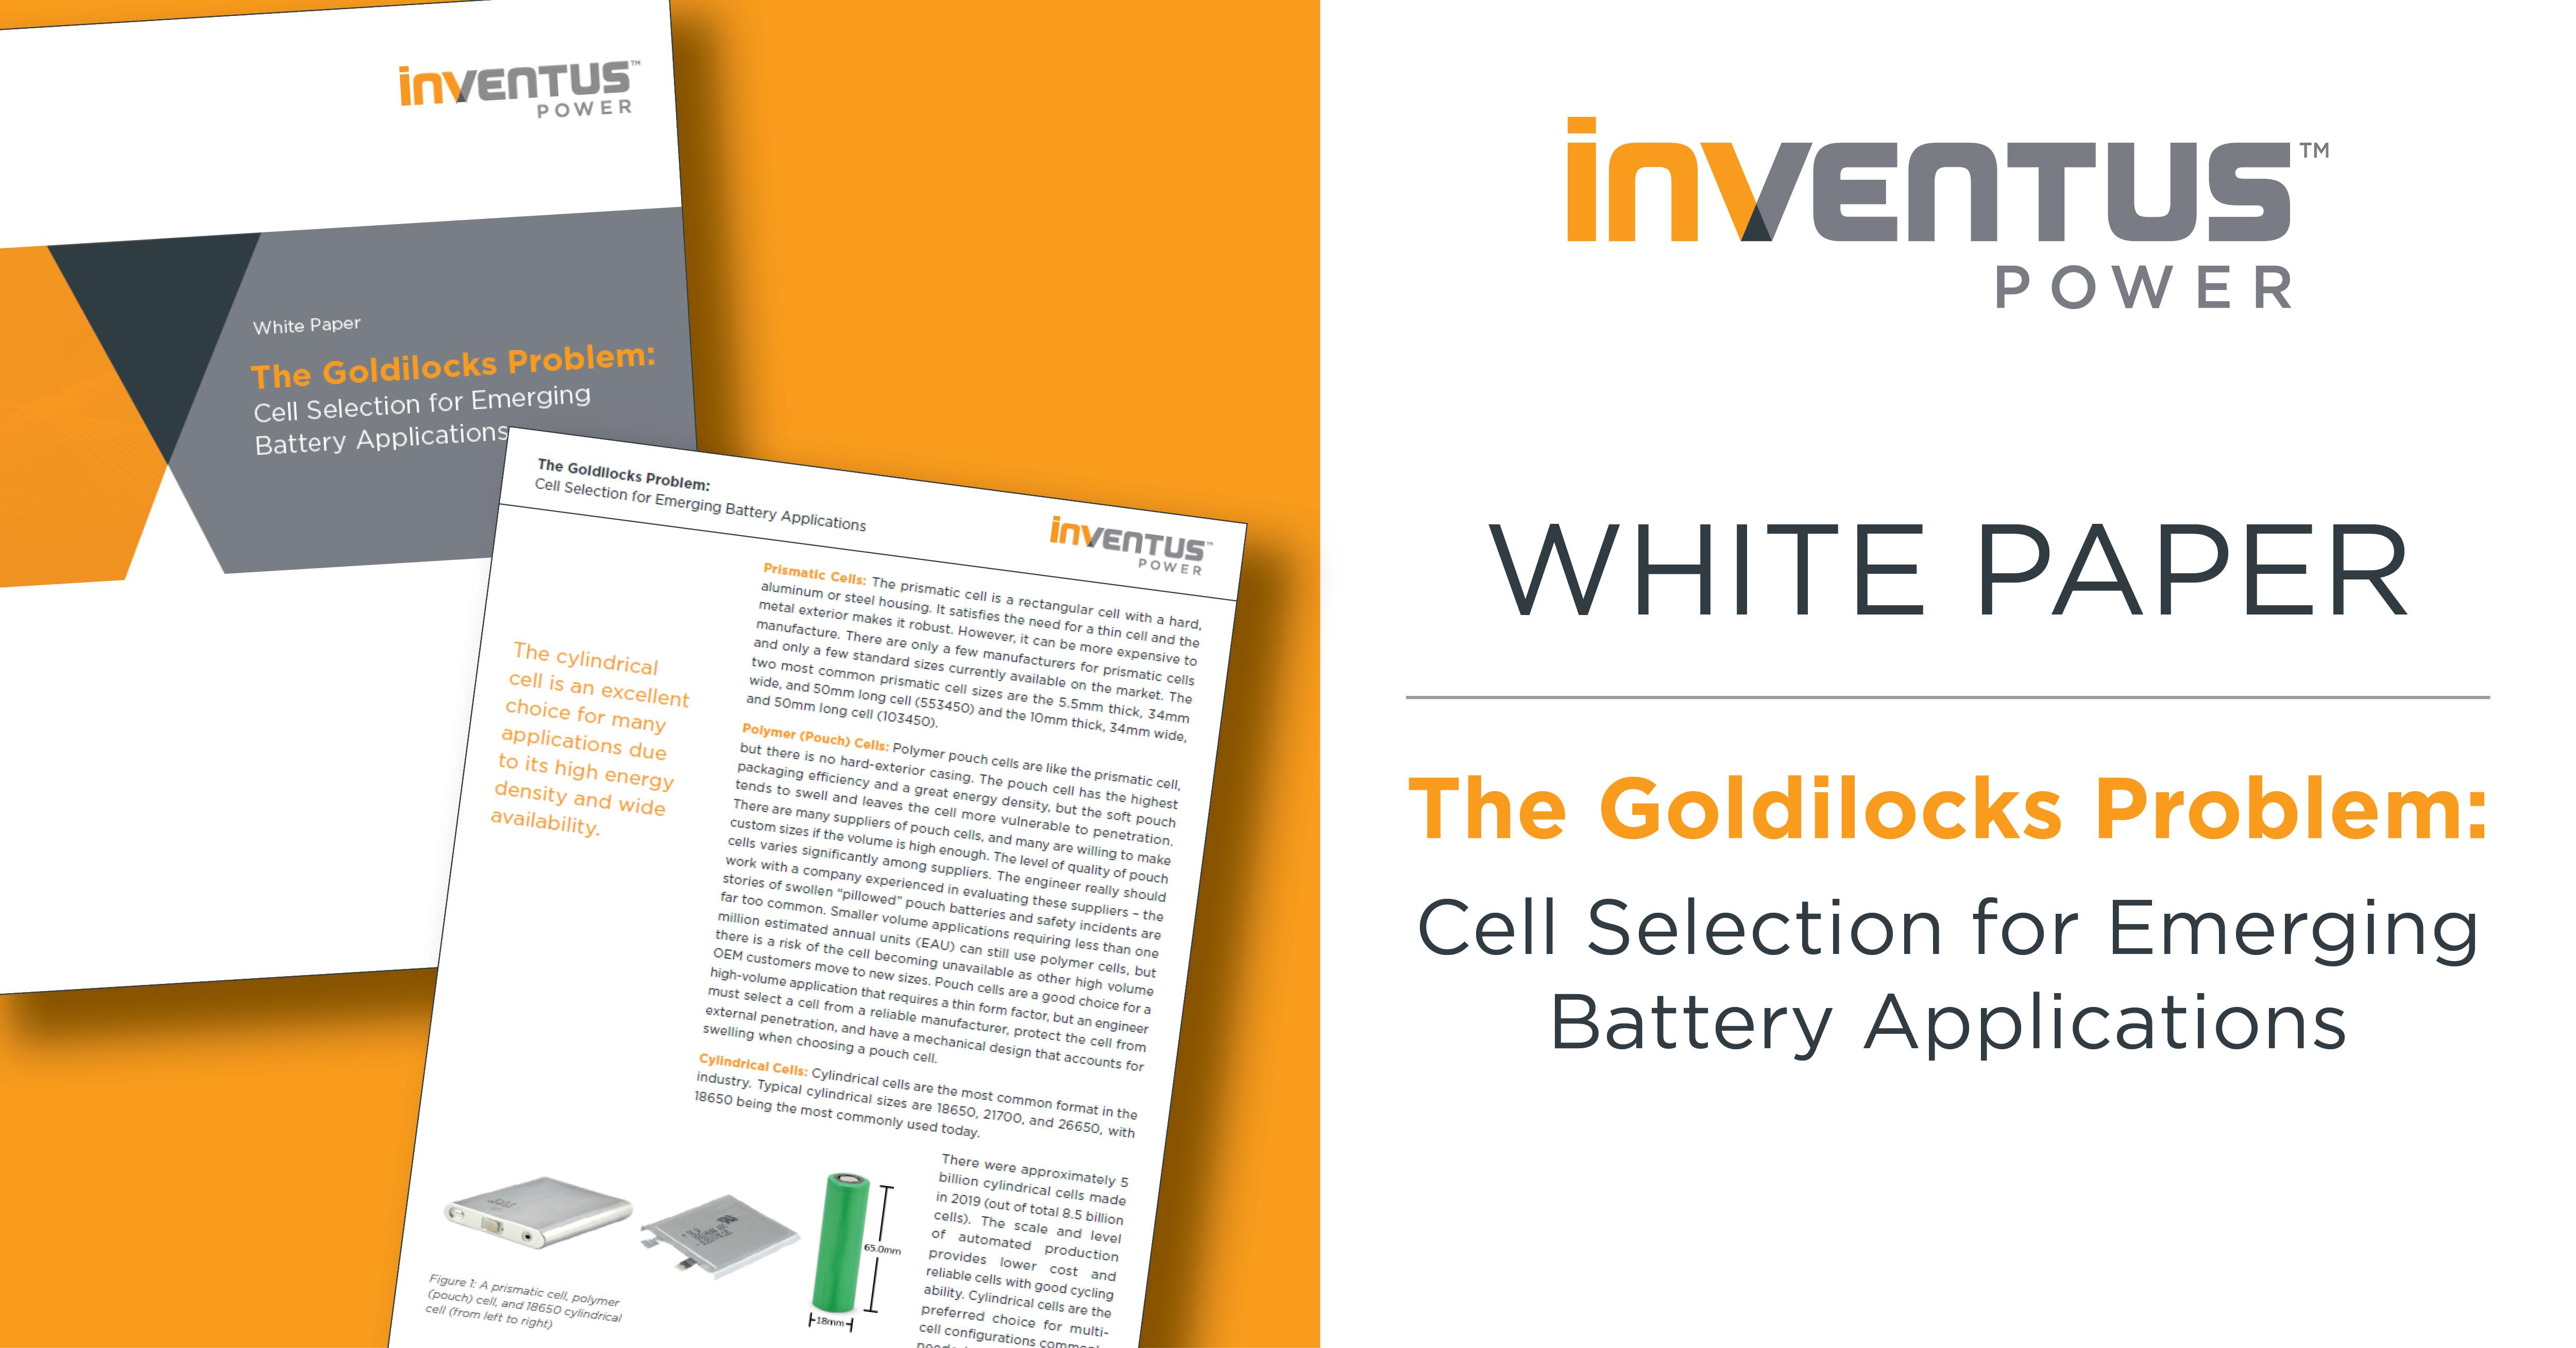 Inventus Power_White Paper_Goldilocks 2020_V1